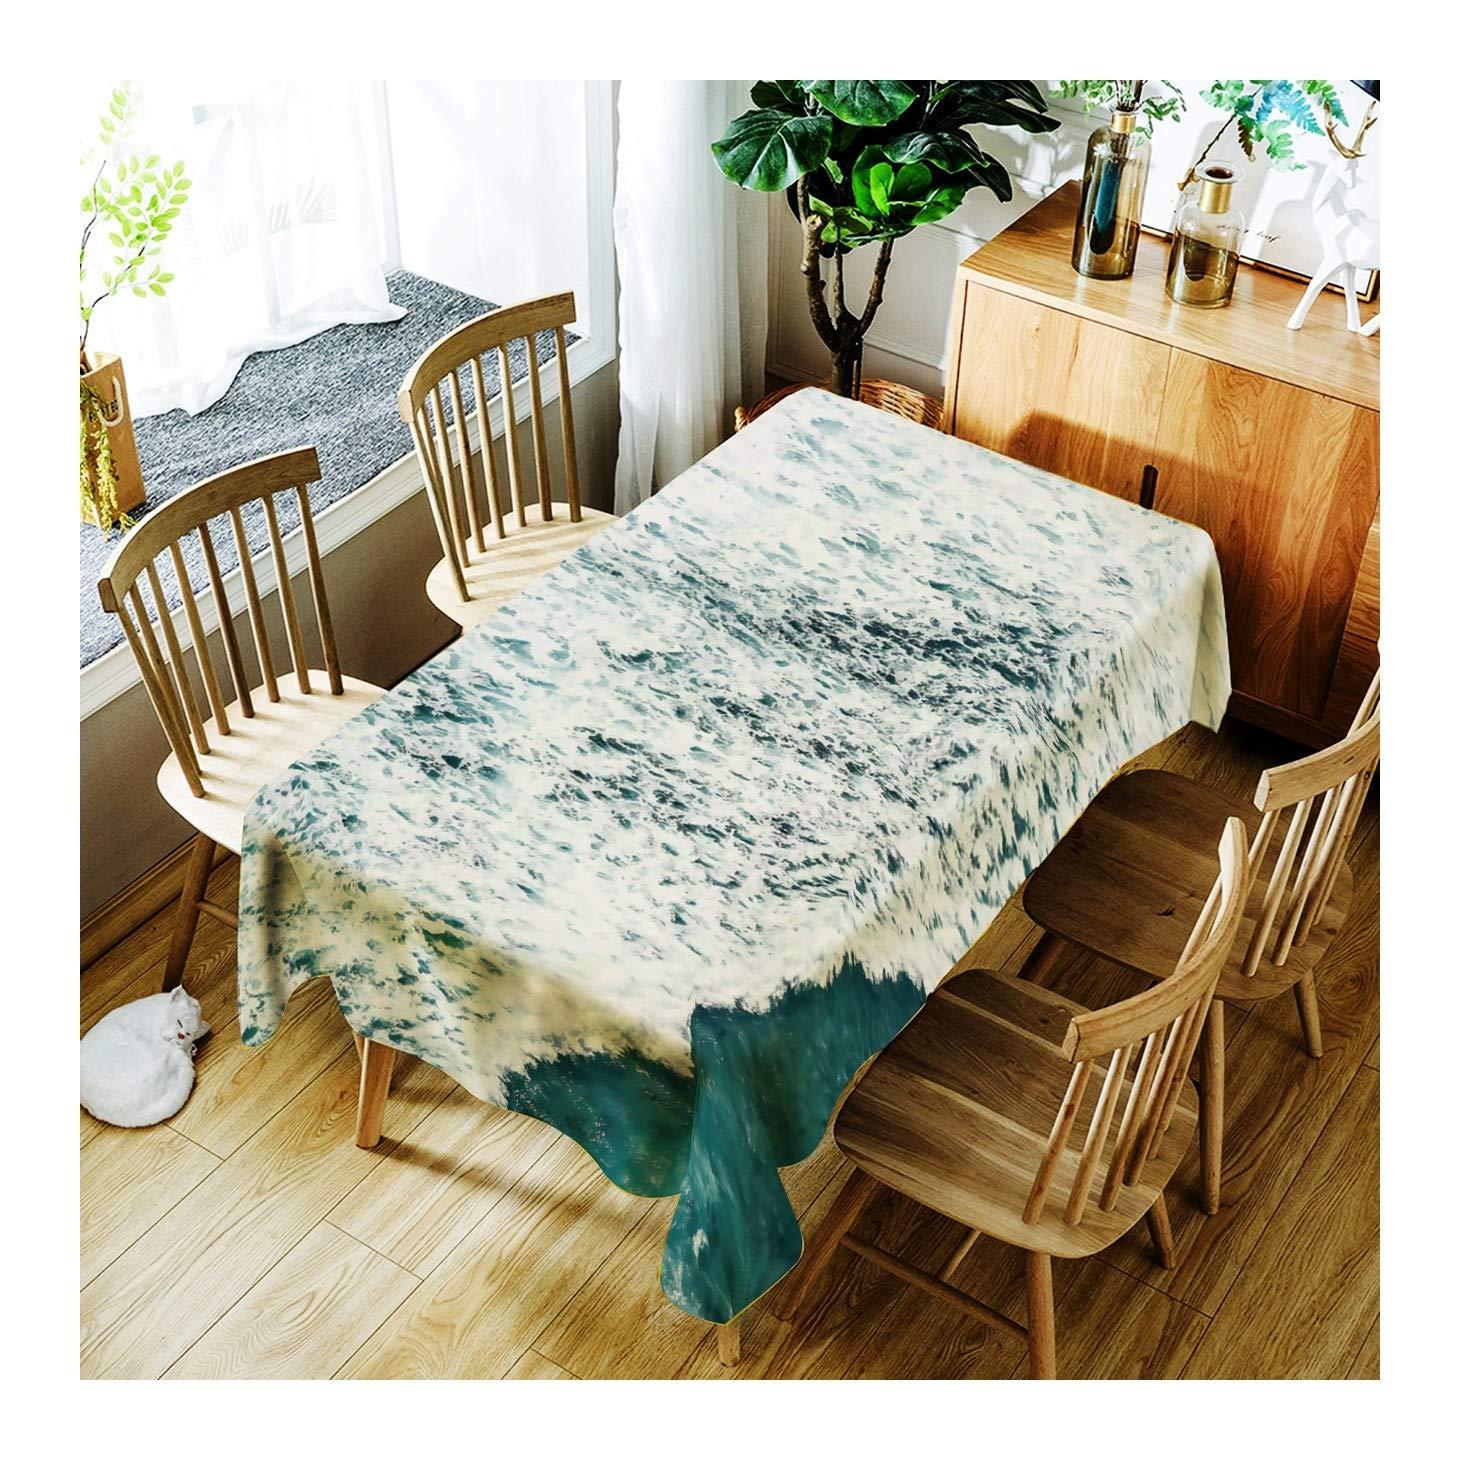 ZHAOXIANGXIANG Lavable Minimalista Elegante Table Estera Hermoso Patrón De Onda Decoracion Un Mantel,140Cmtimes;280Cm